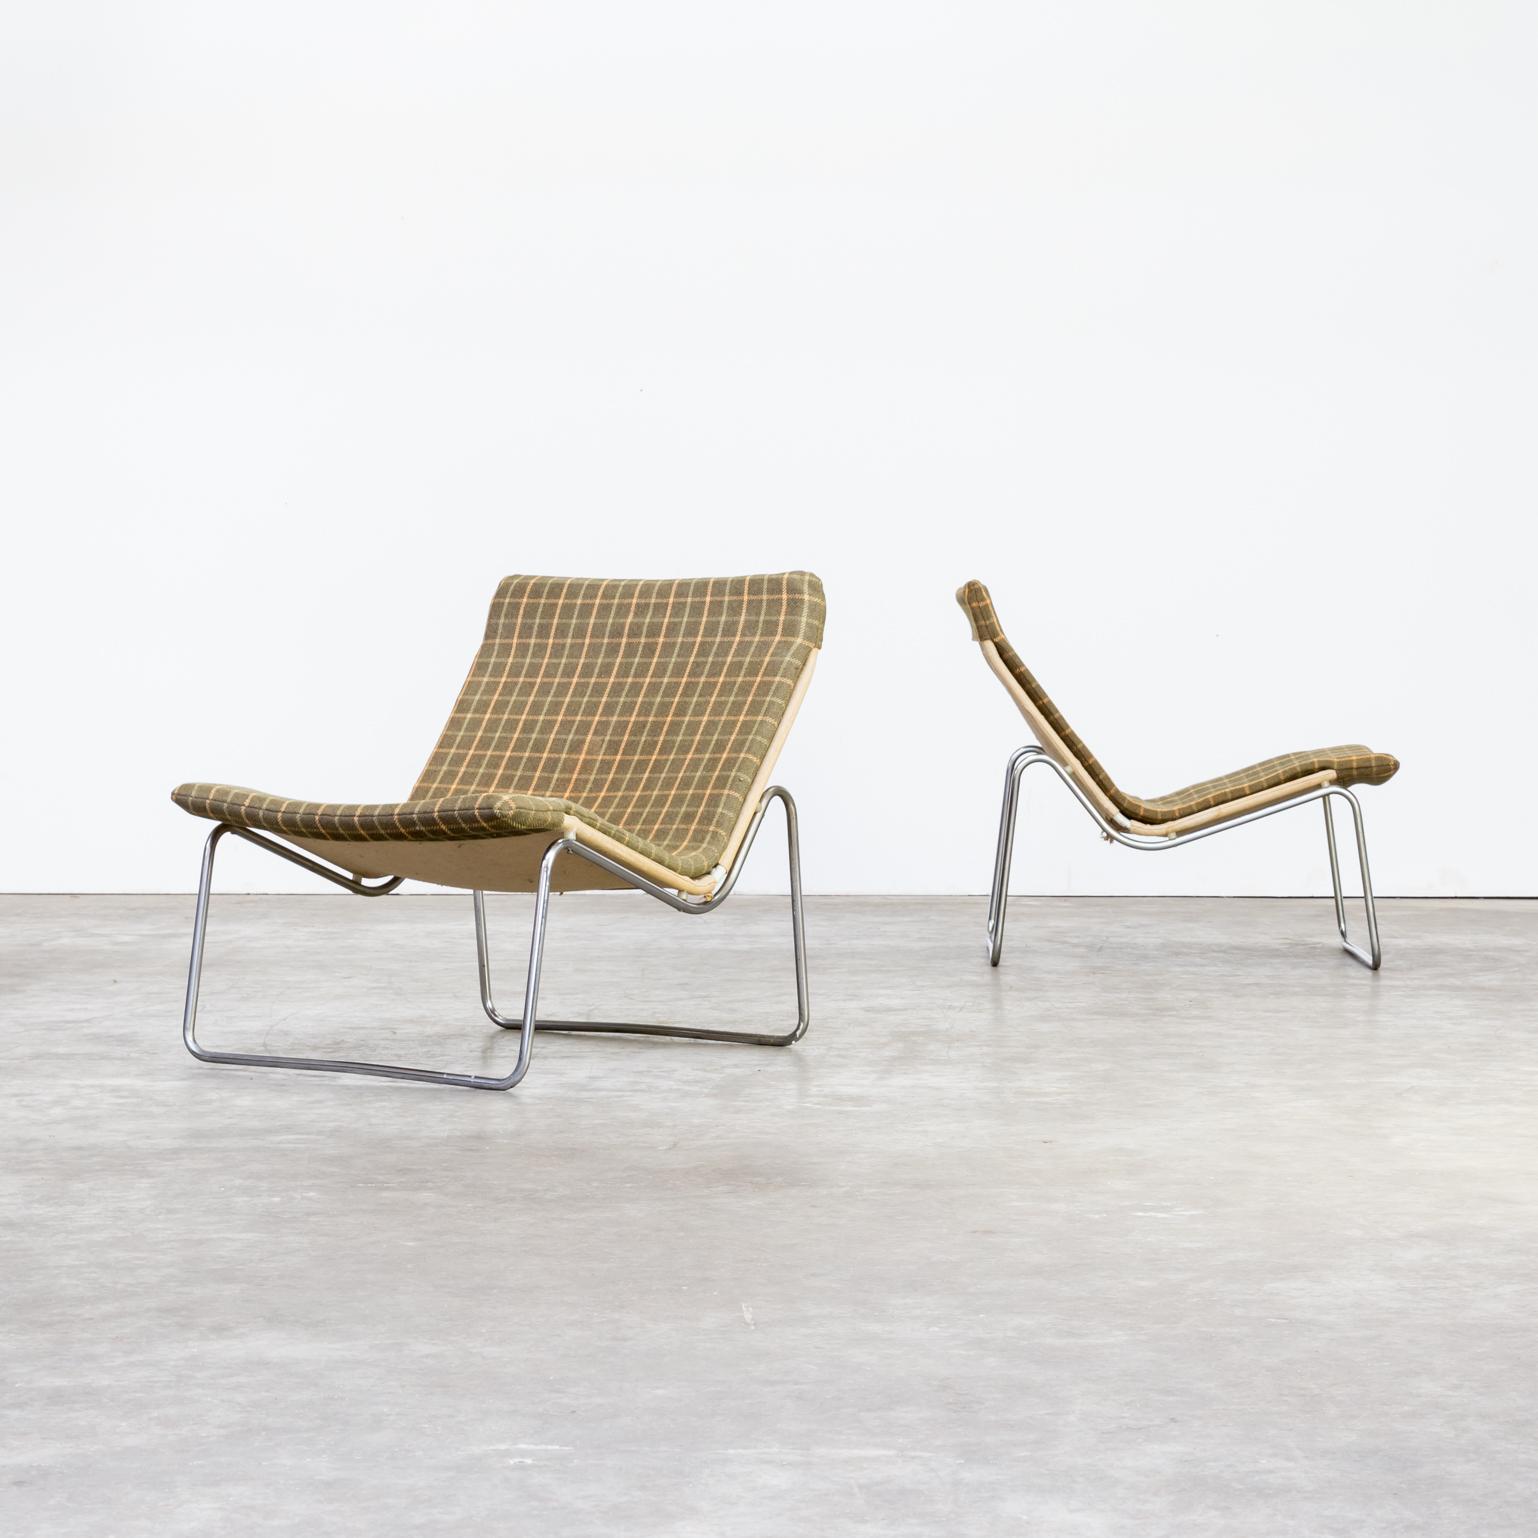 Fauteuil Retro Design.60s Scandinavian Design Low Fauteuil Set 2